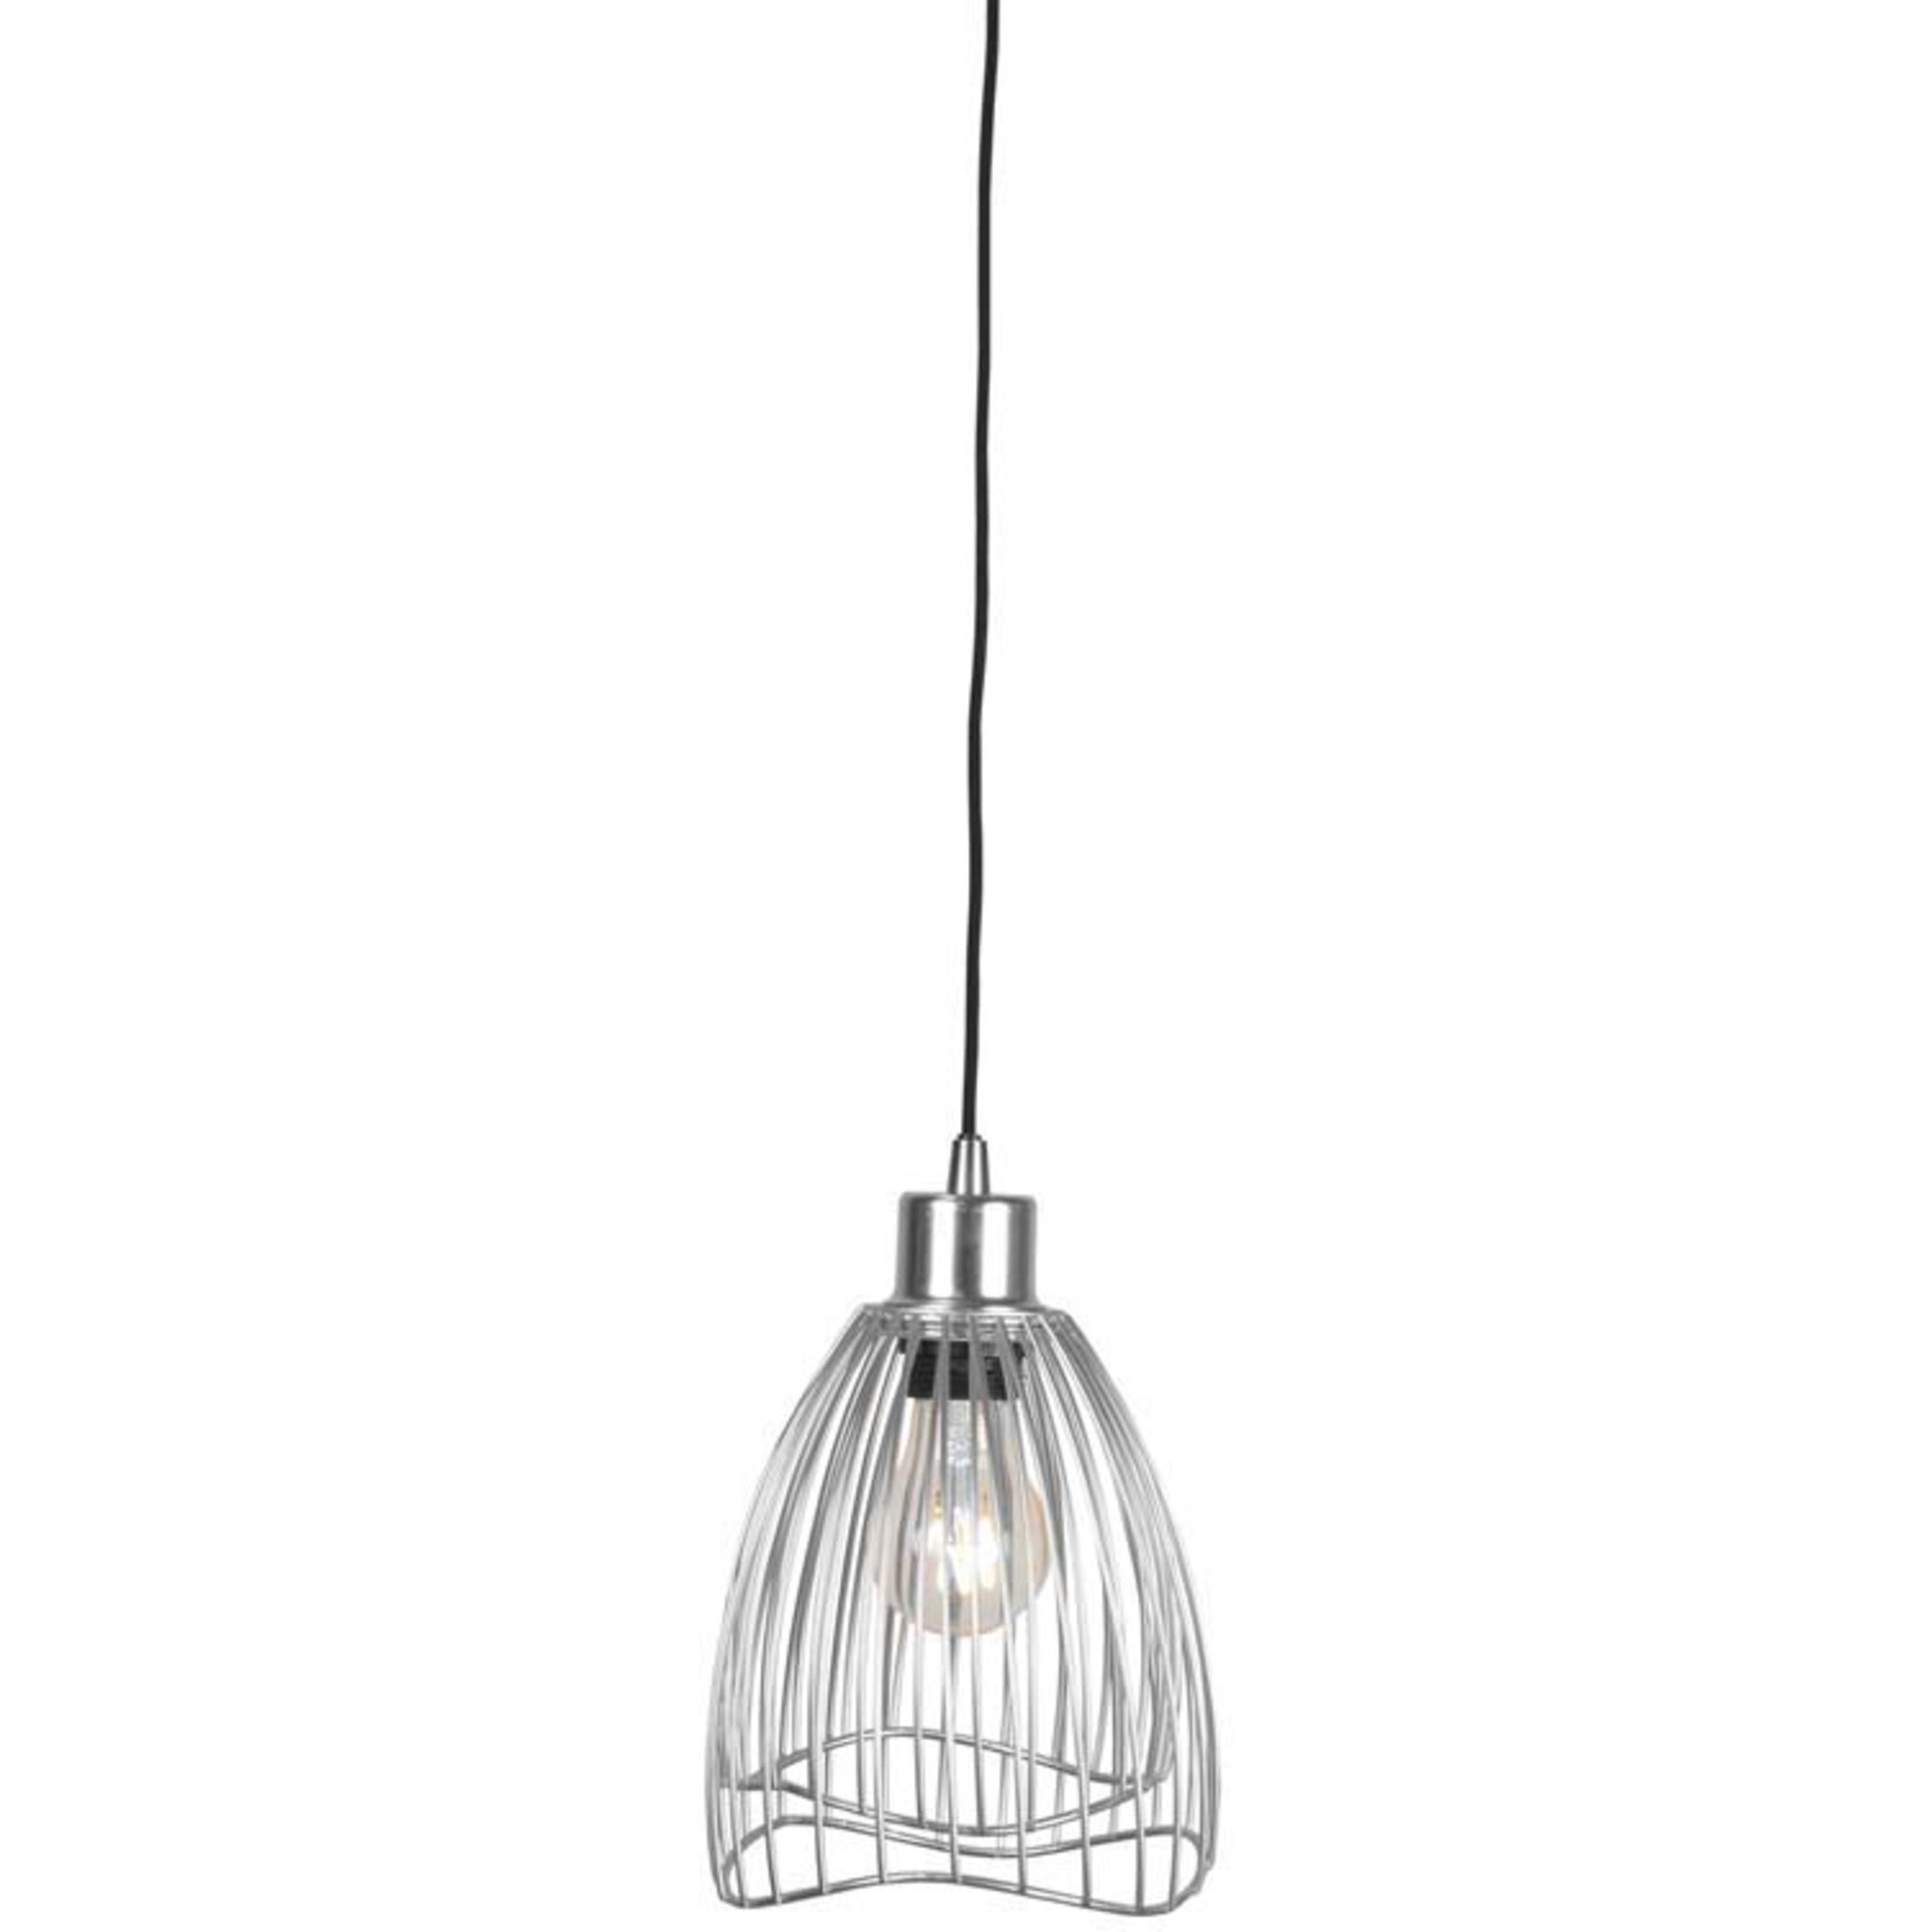 Globen Lighting Bord/Pendel Mini Ray Krom